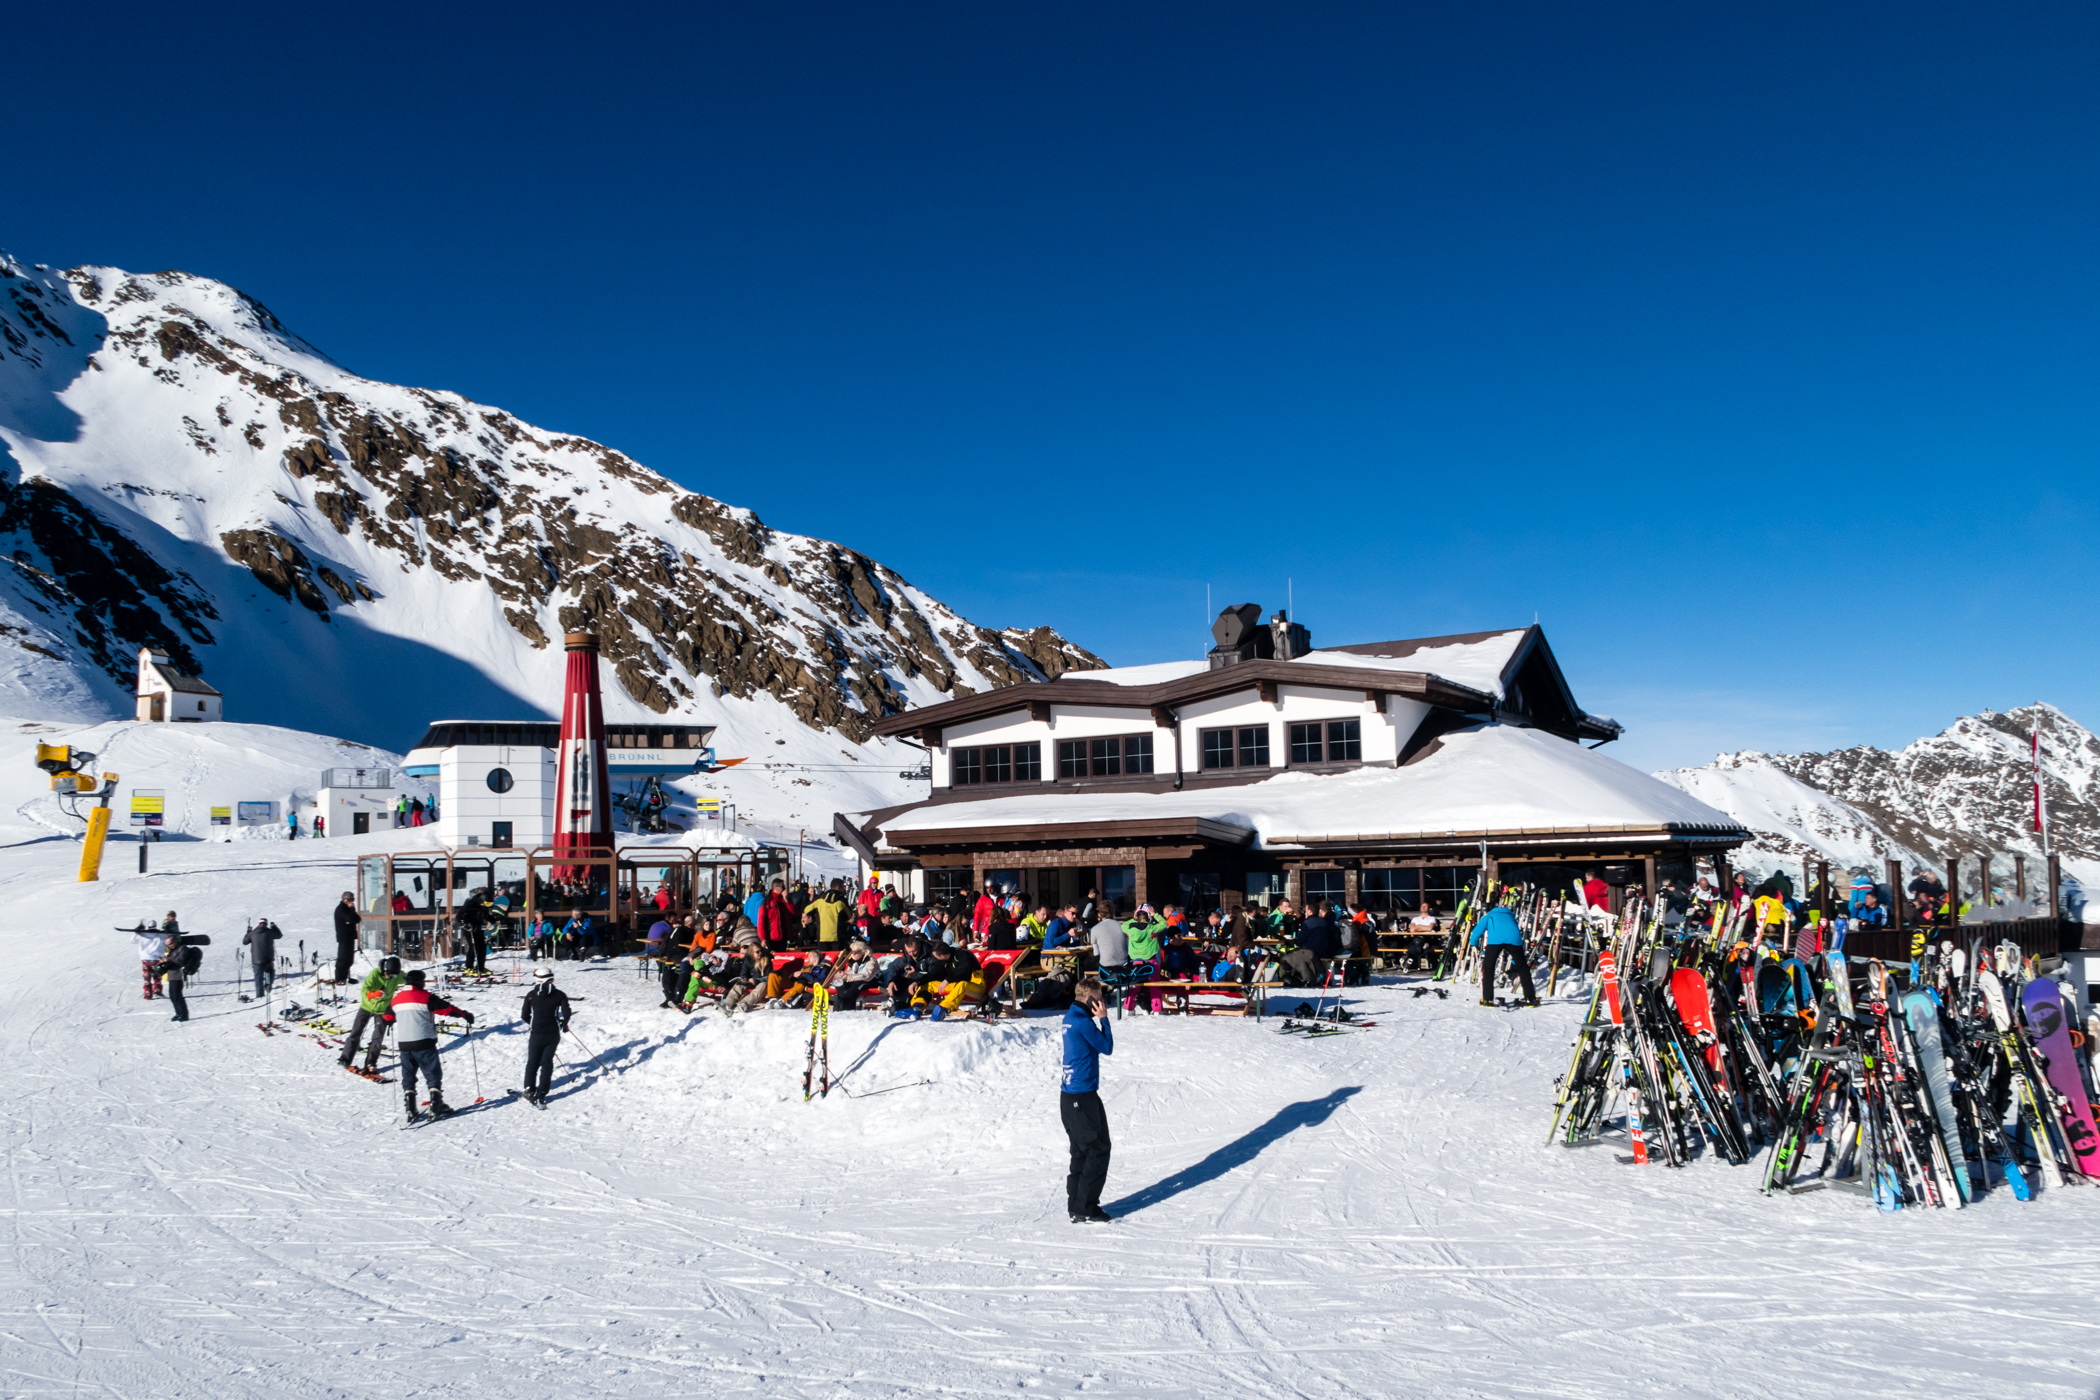 Hvis sneforholdene tillader det, kan du spise frokost nede på Rotkogelhüttes solterasse // Foto: Troels Kjems